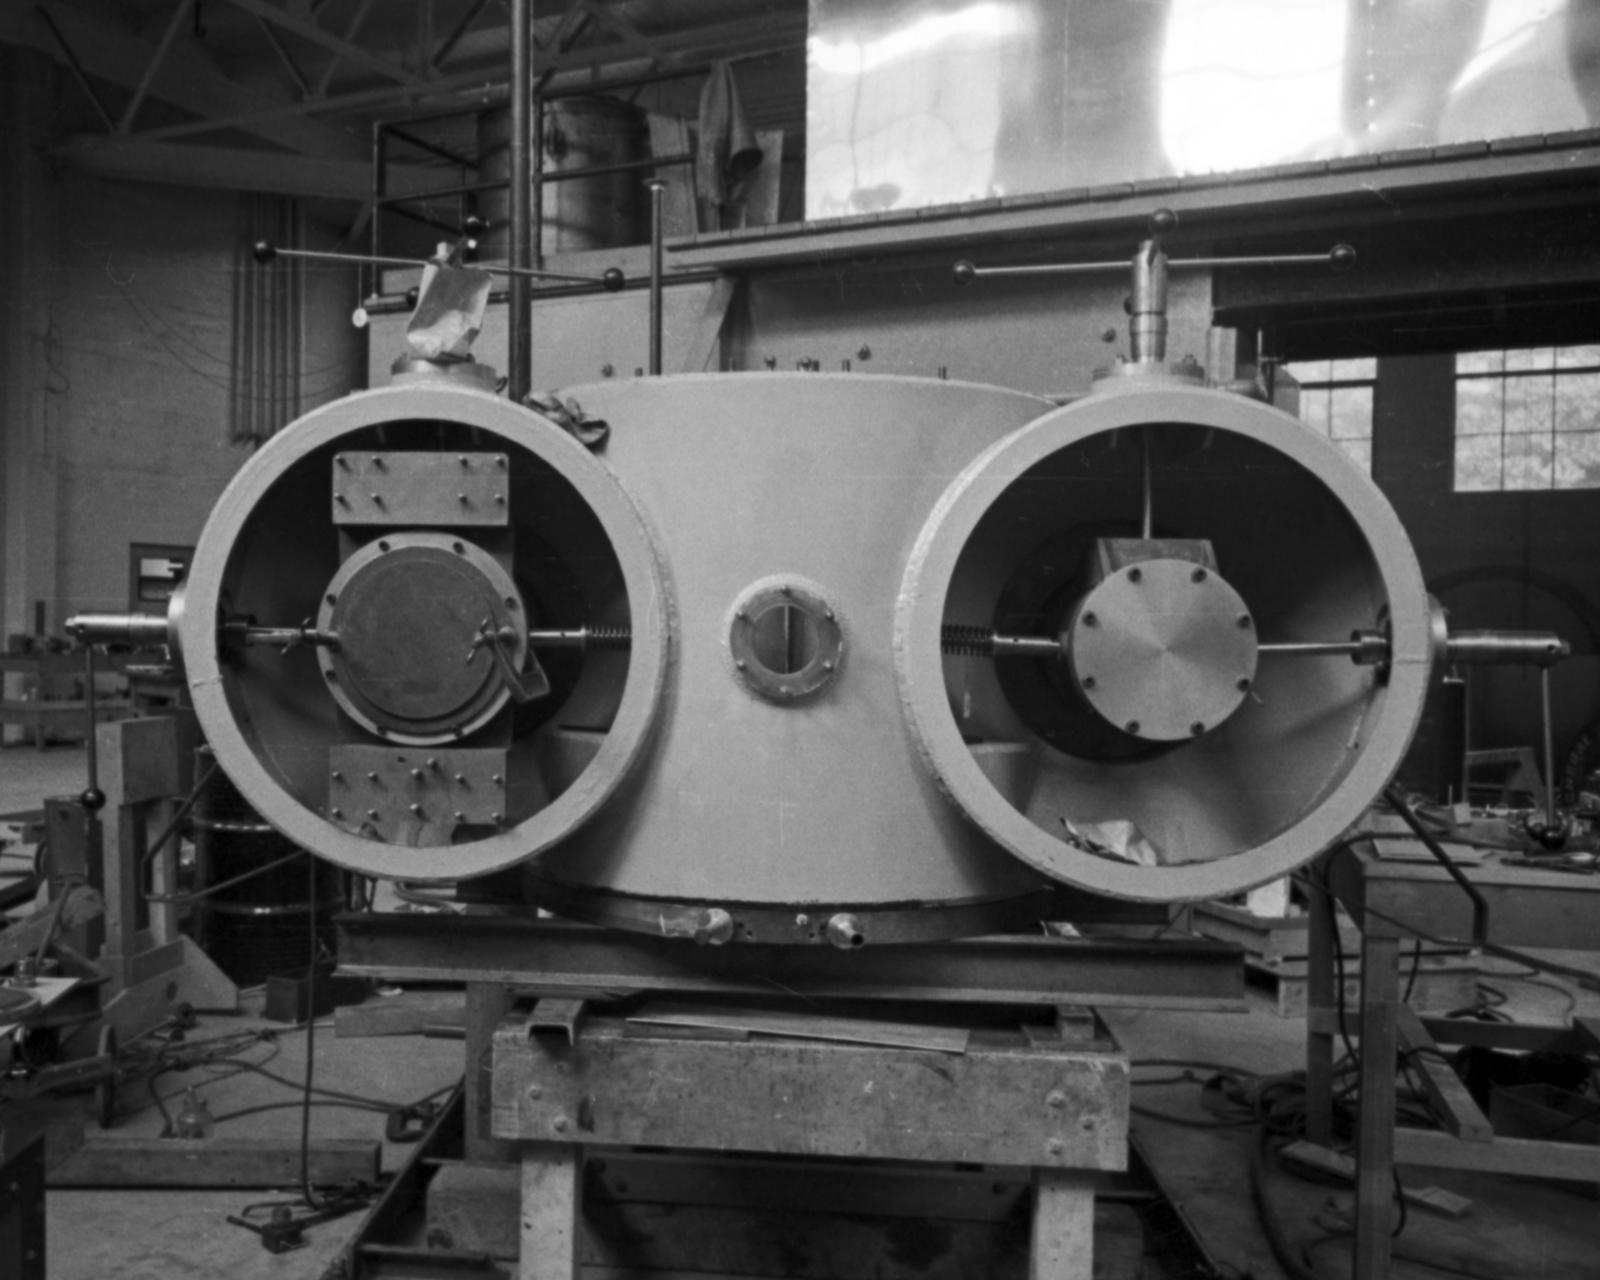 60-inch cyclotron tanks. Cooksey  14-3,  Feburary 1, 1939. [Photographer: Donald Cooksey]